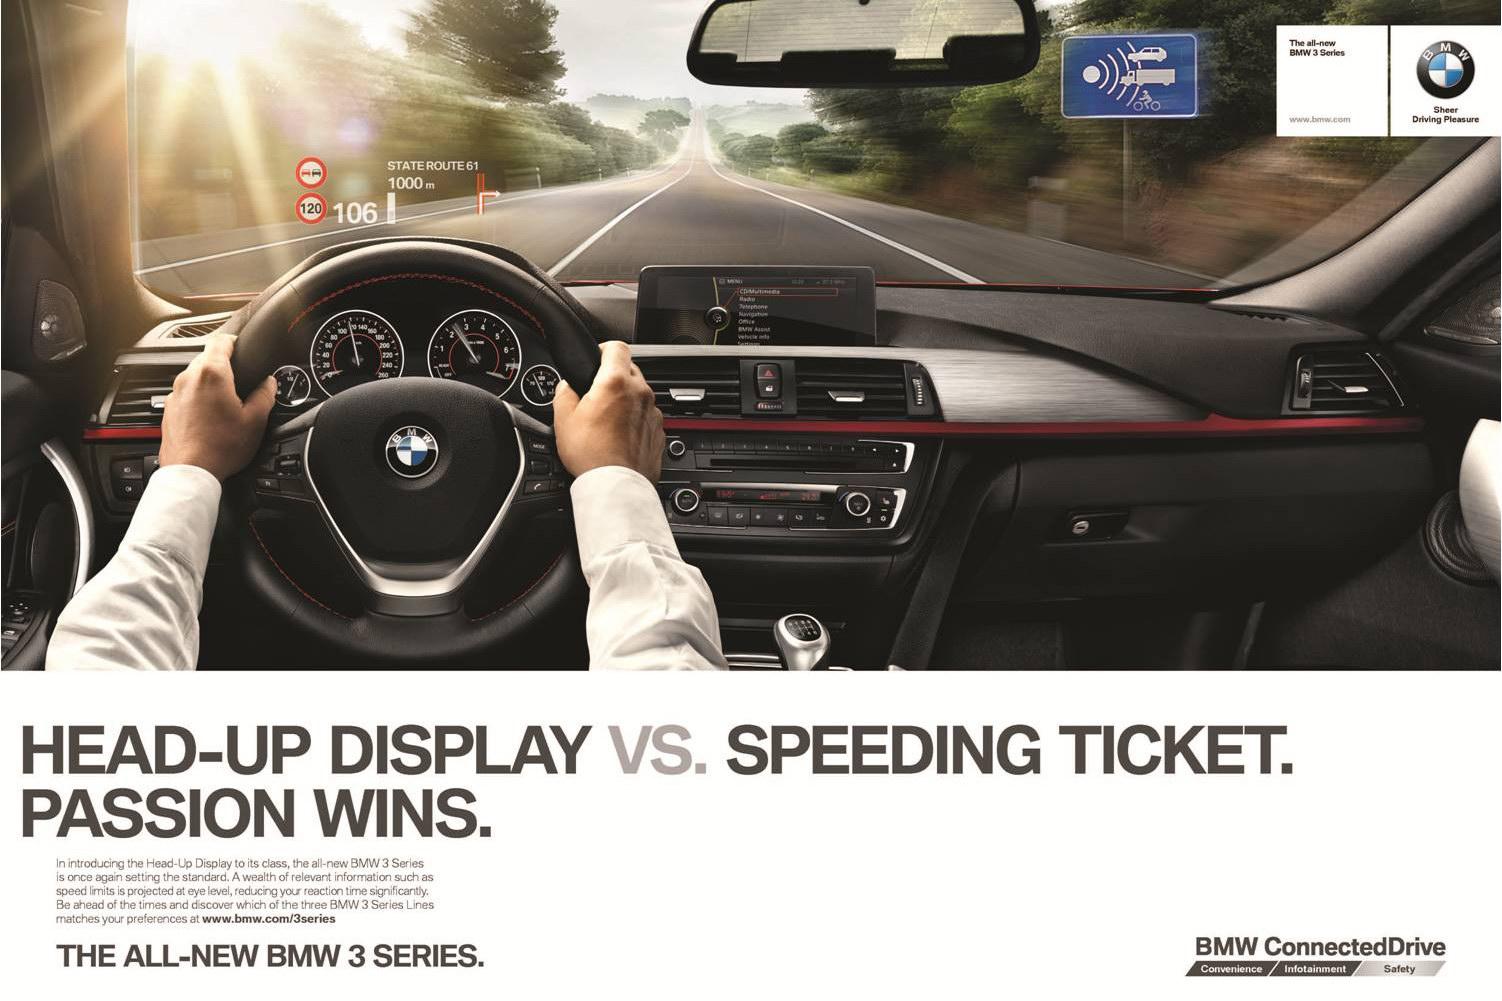 2012 Bmw 3 Series F30 Marketing Campaign Passion Wins Autoevolution